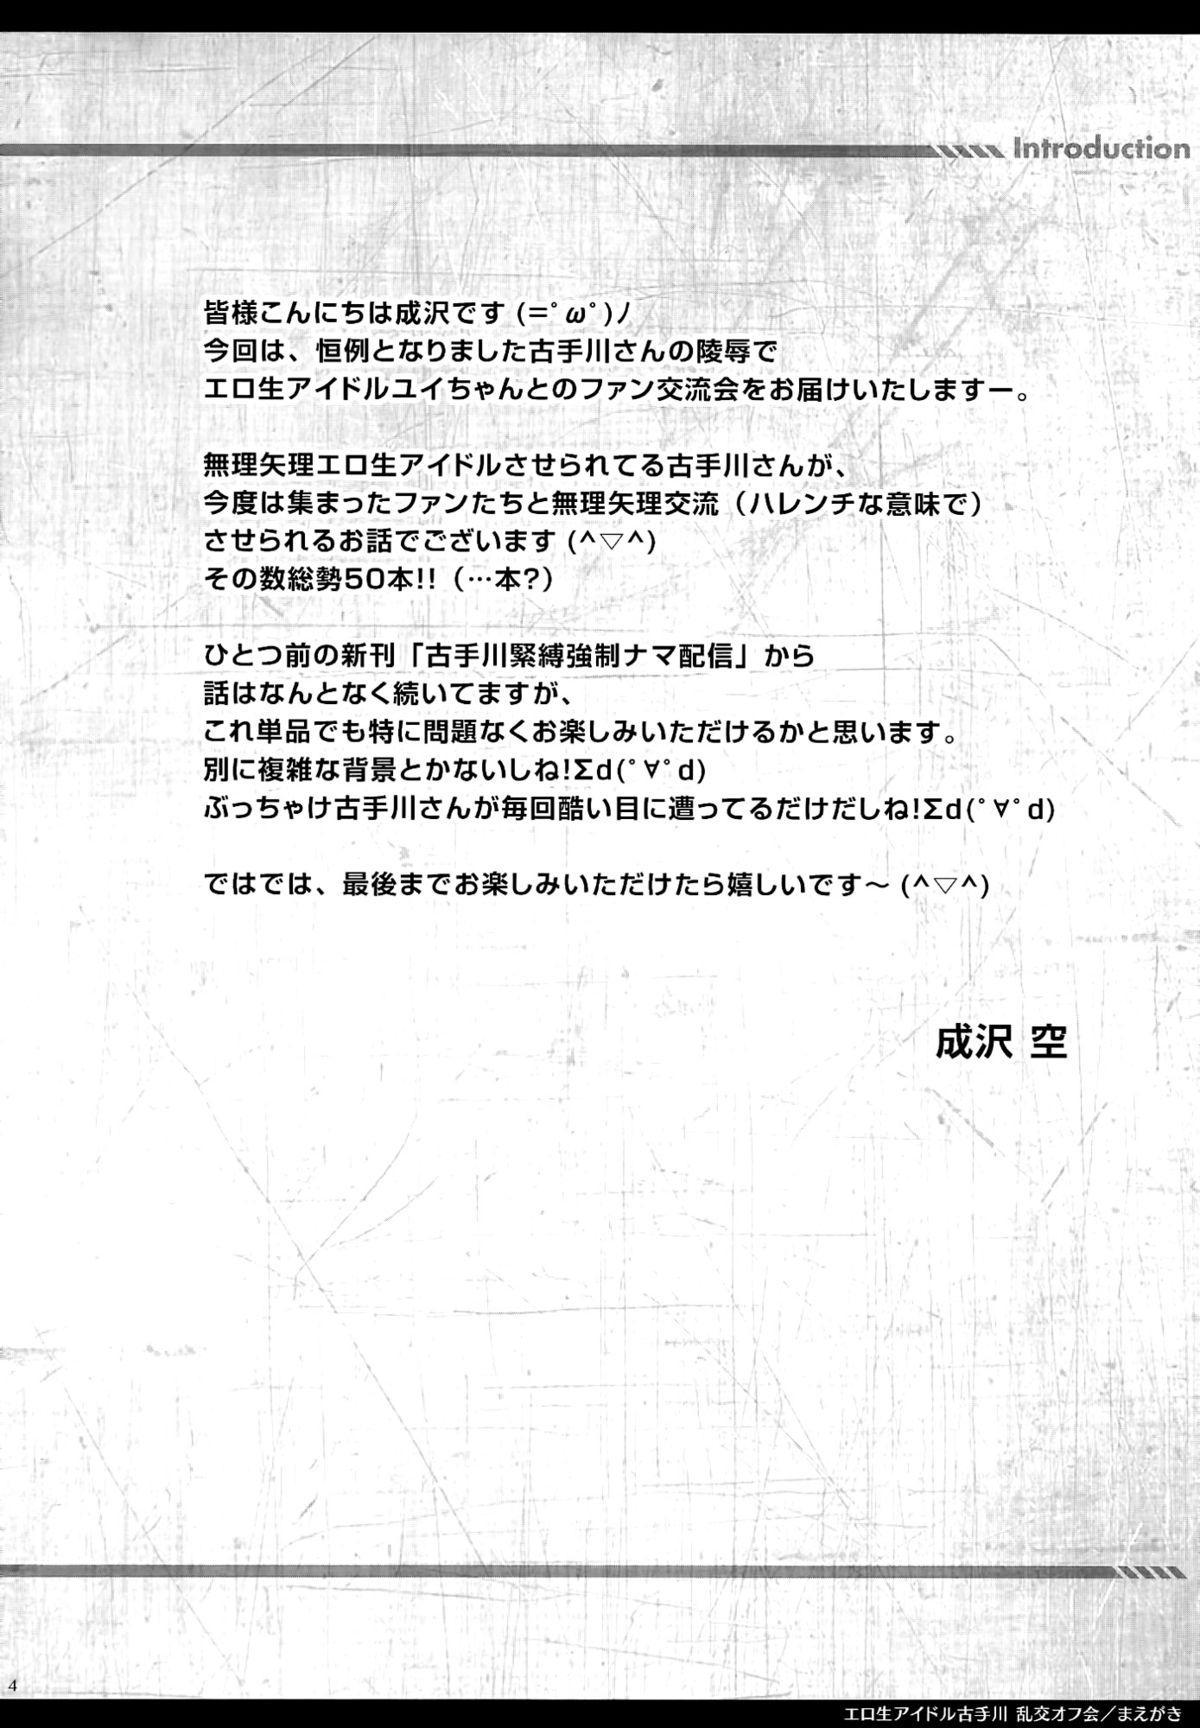 (C86) [Sorairo March (Narusawa Sora)] Eronama Idol Kotegawa - Rankou Off-kai | Erotic Idol Kotegawa - Offline Orgy Meeting (To LOVE-Ru) [English] {doujin-moe.us} 2